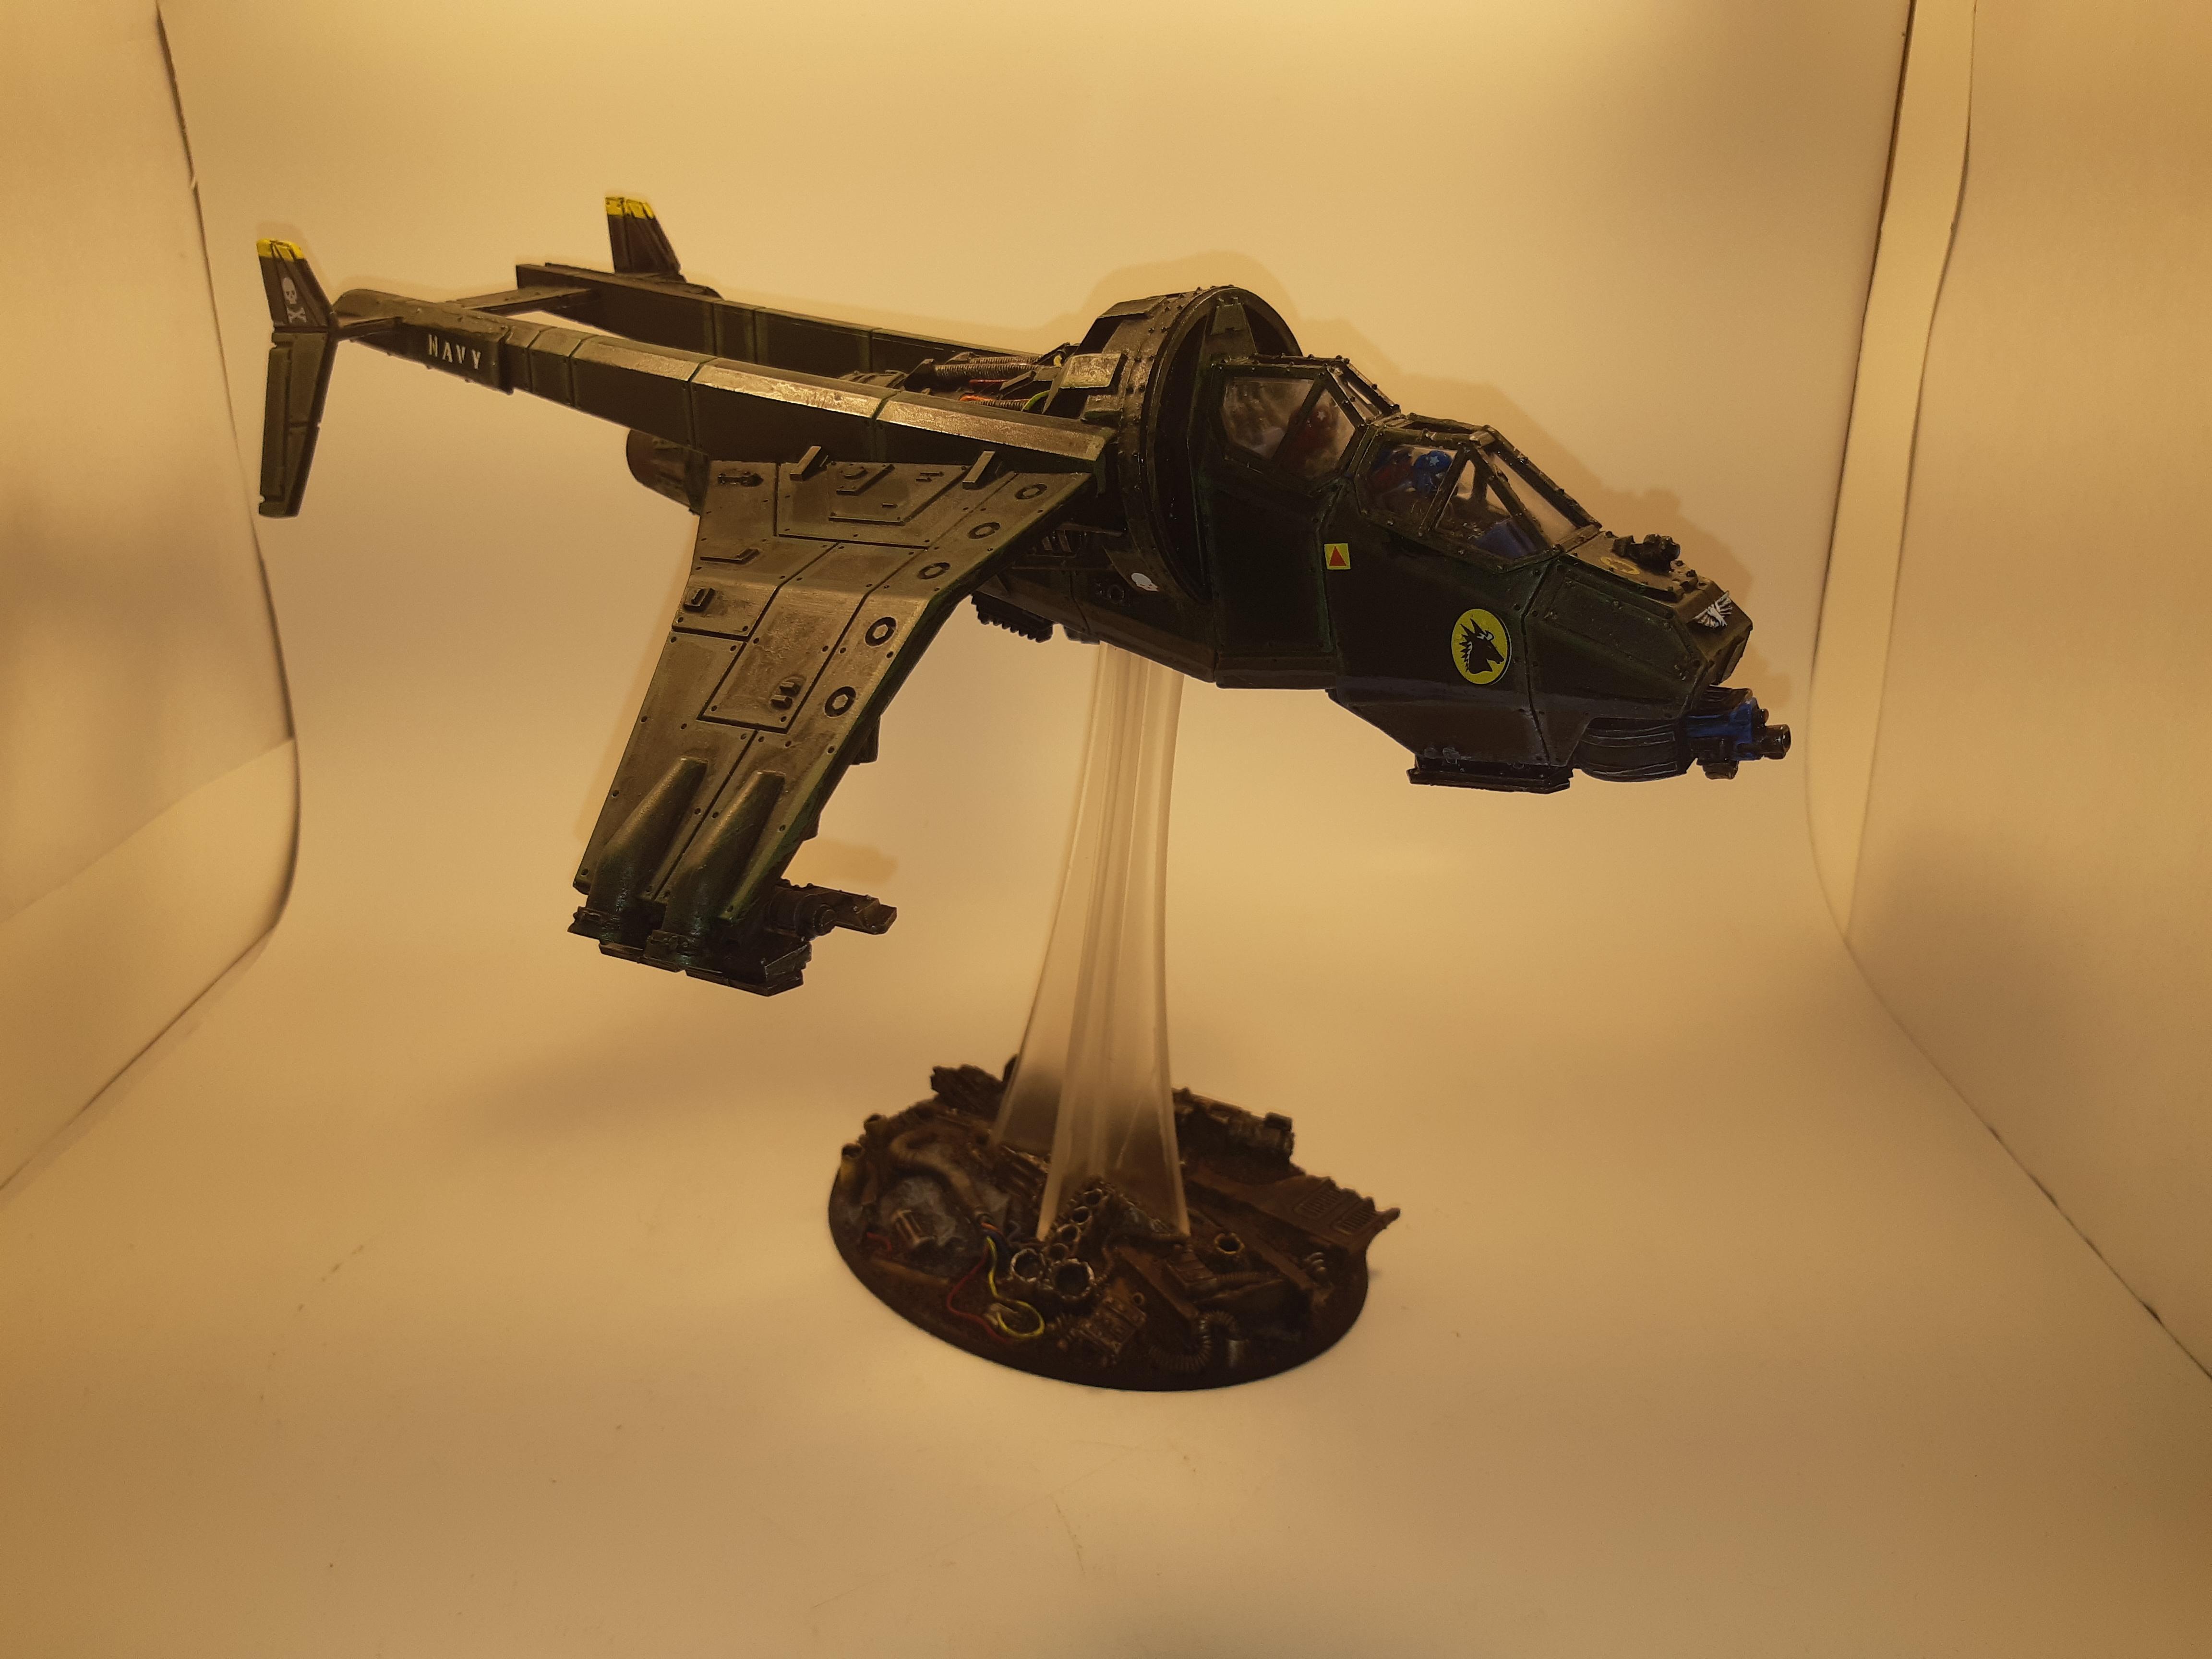 120 Mm, 120mm, Base, Flyer, Forge World, Gunship, Imperial Guard, Kromlech, Oval, Resin, Vulture, Warhammer 40,000